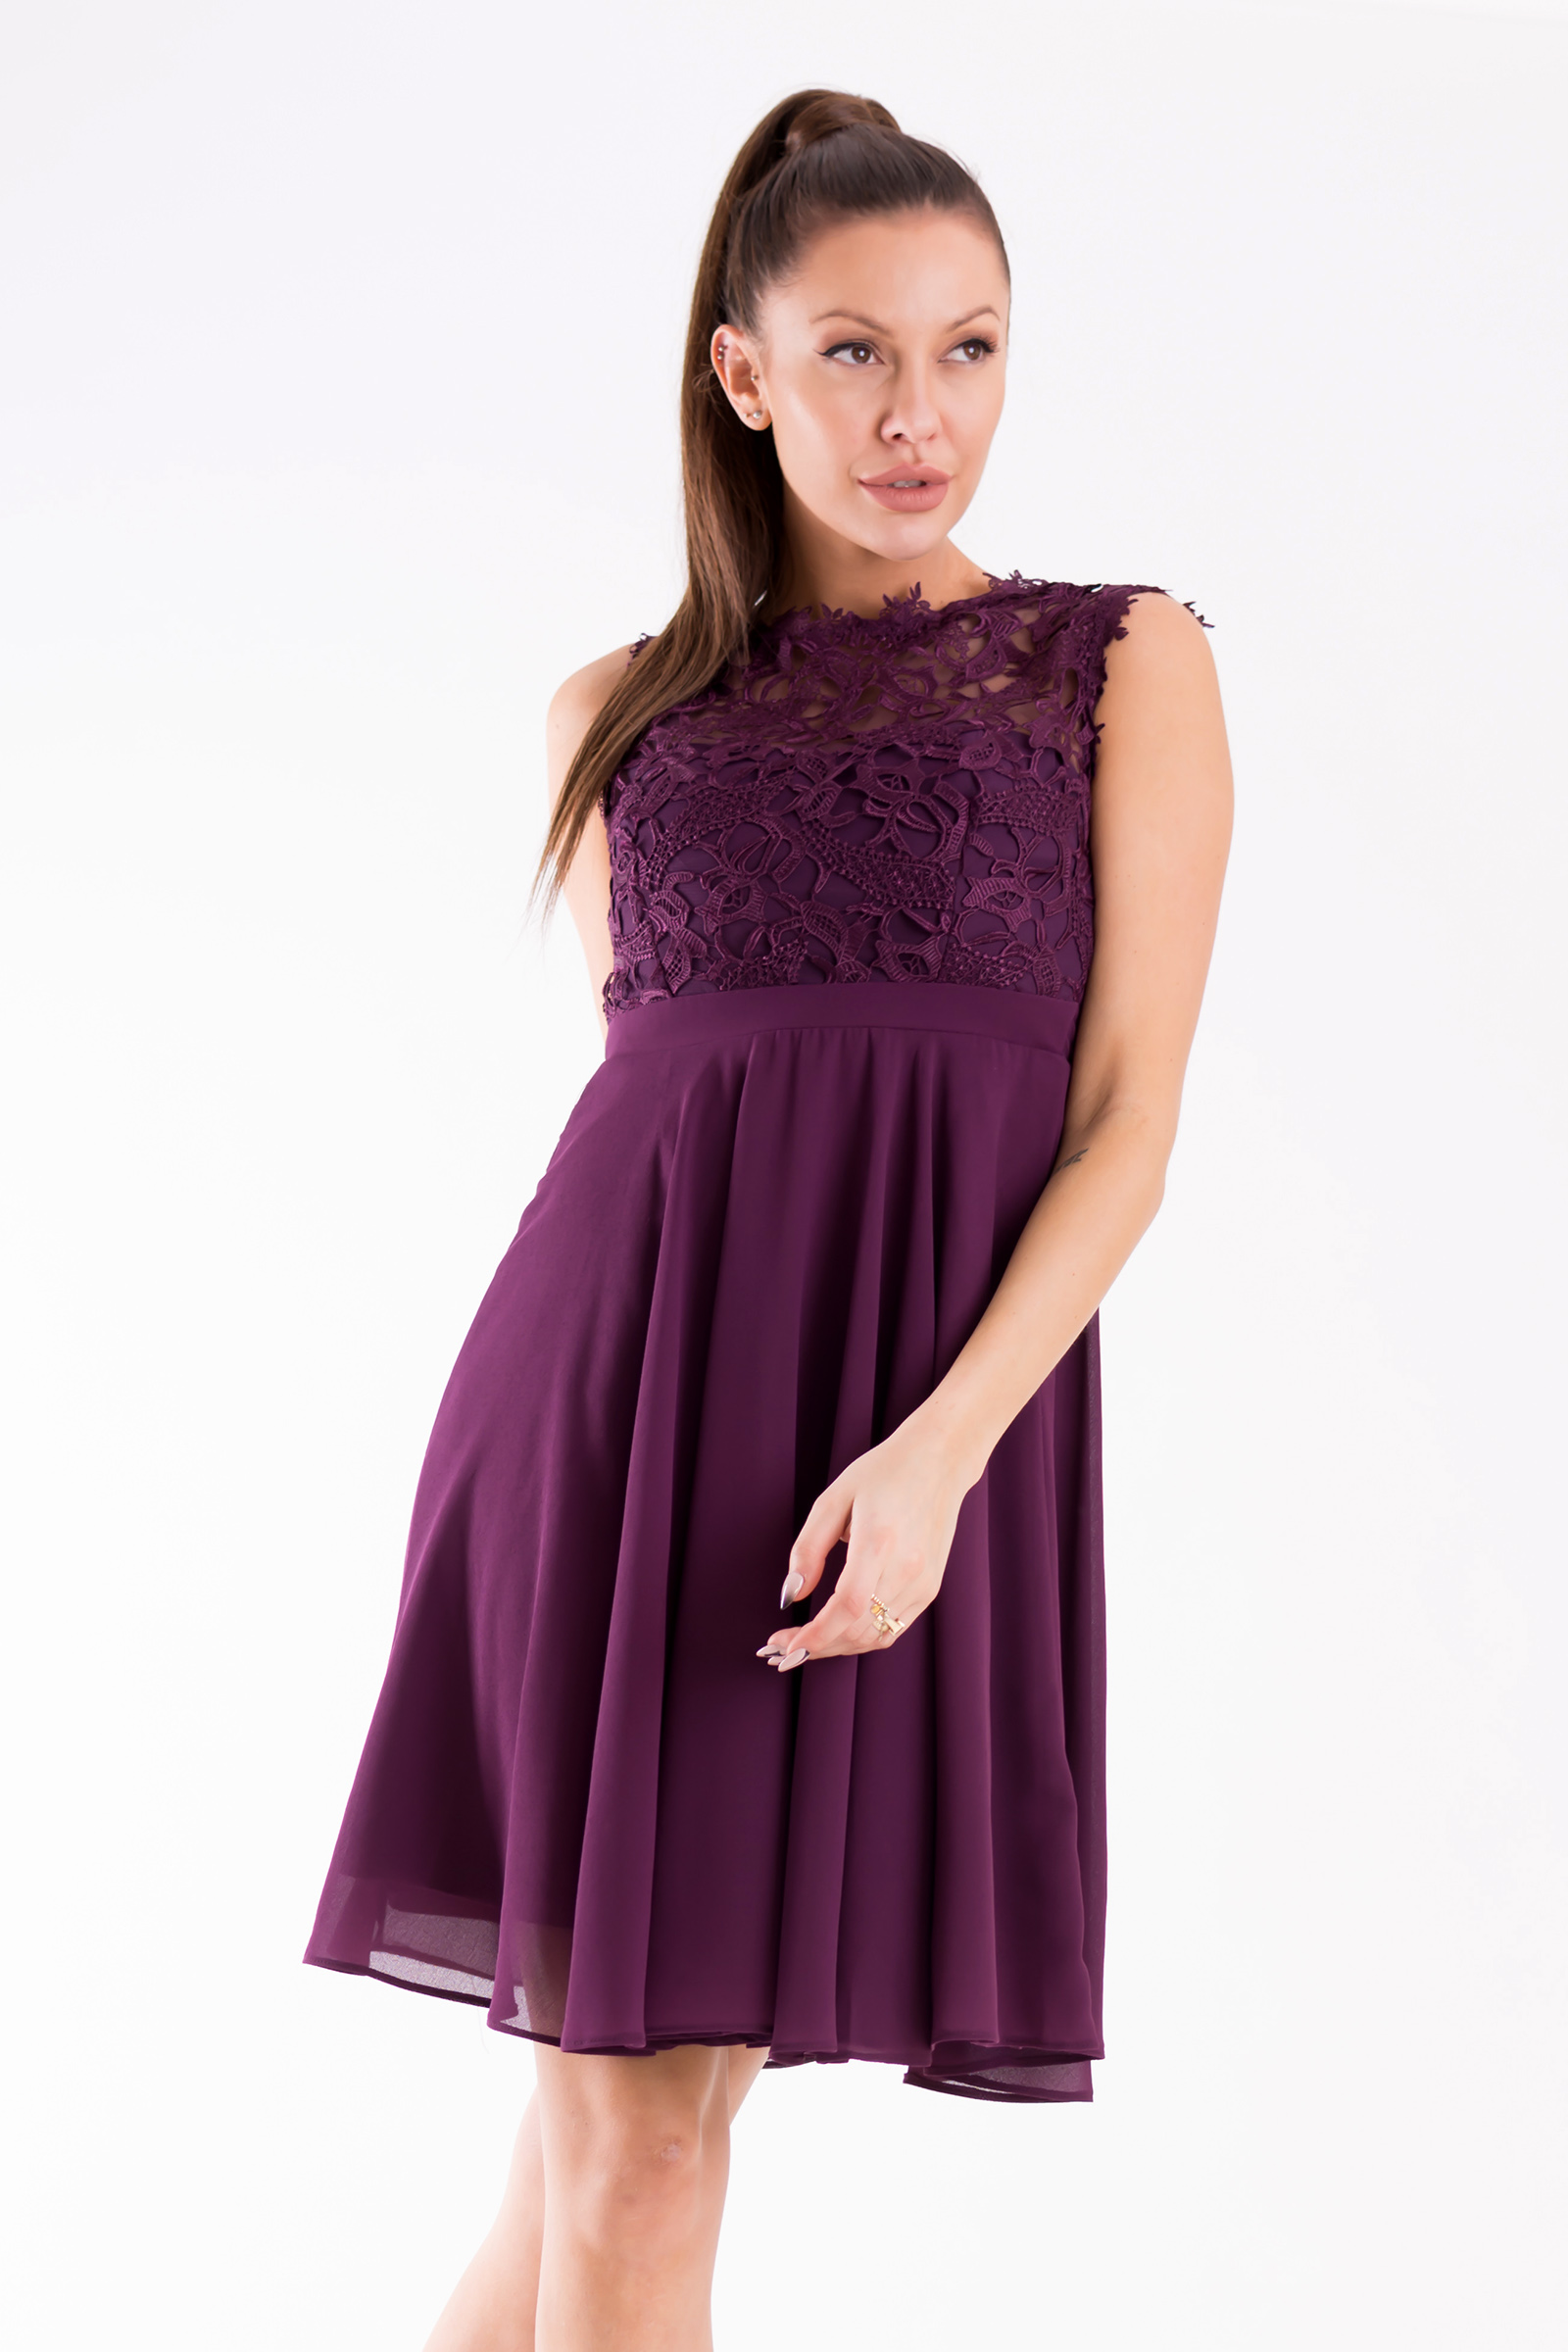 EVA & LOLA DRESS plum 26012-11